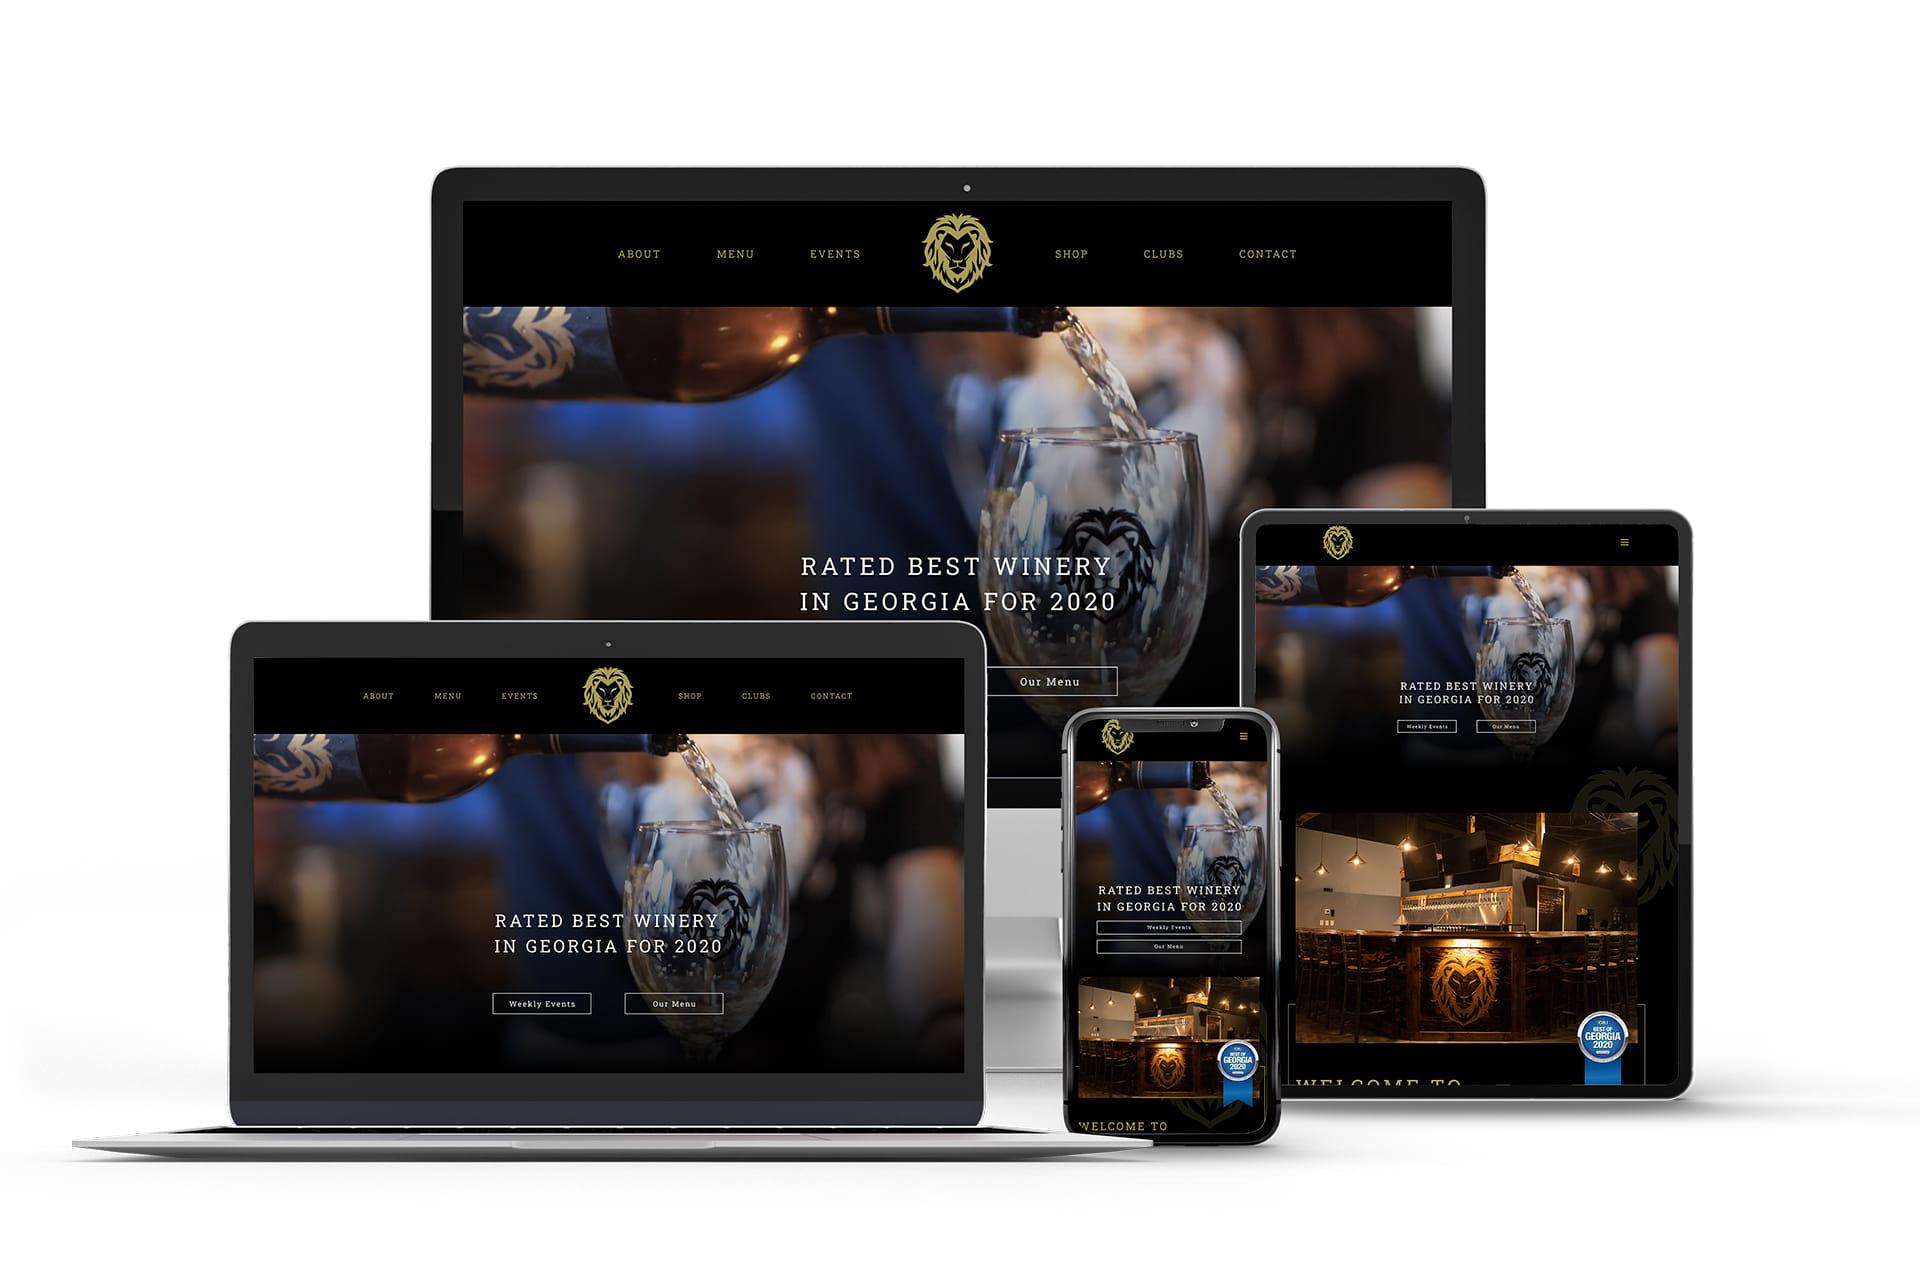 Shezmu Cellars website mockups on multiple devices